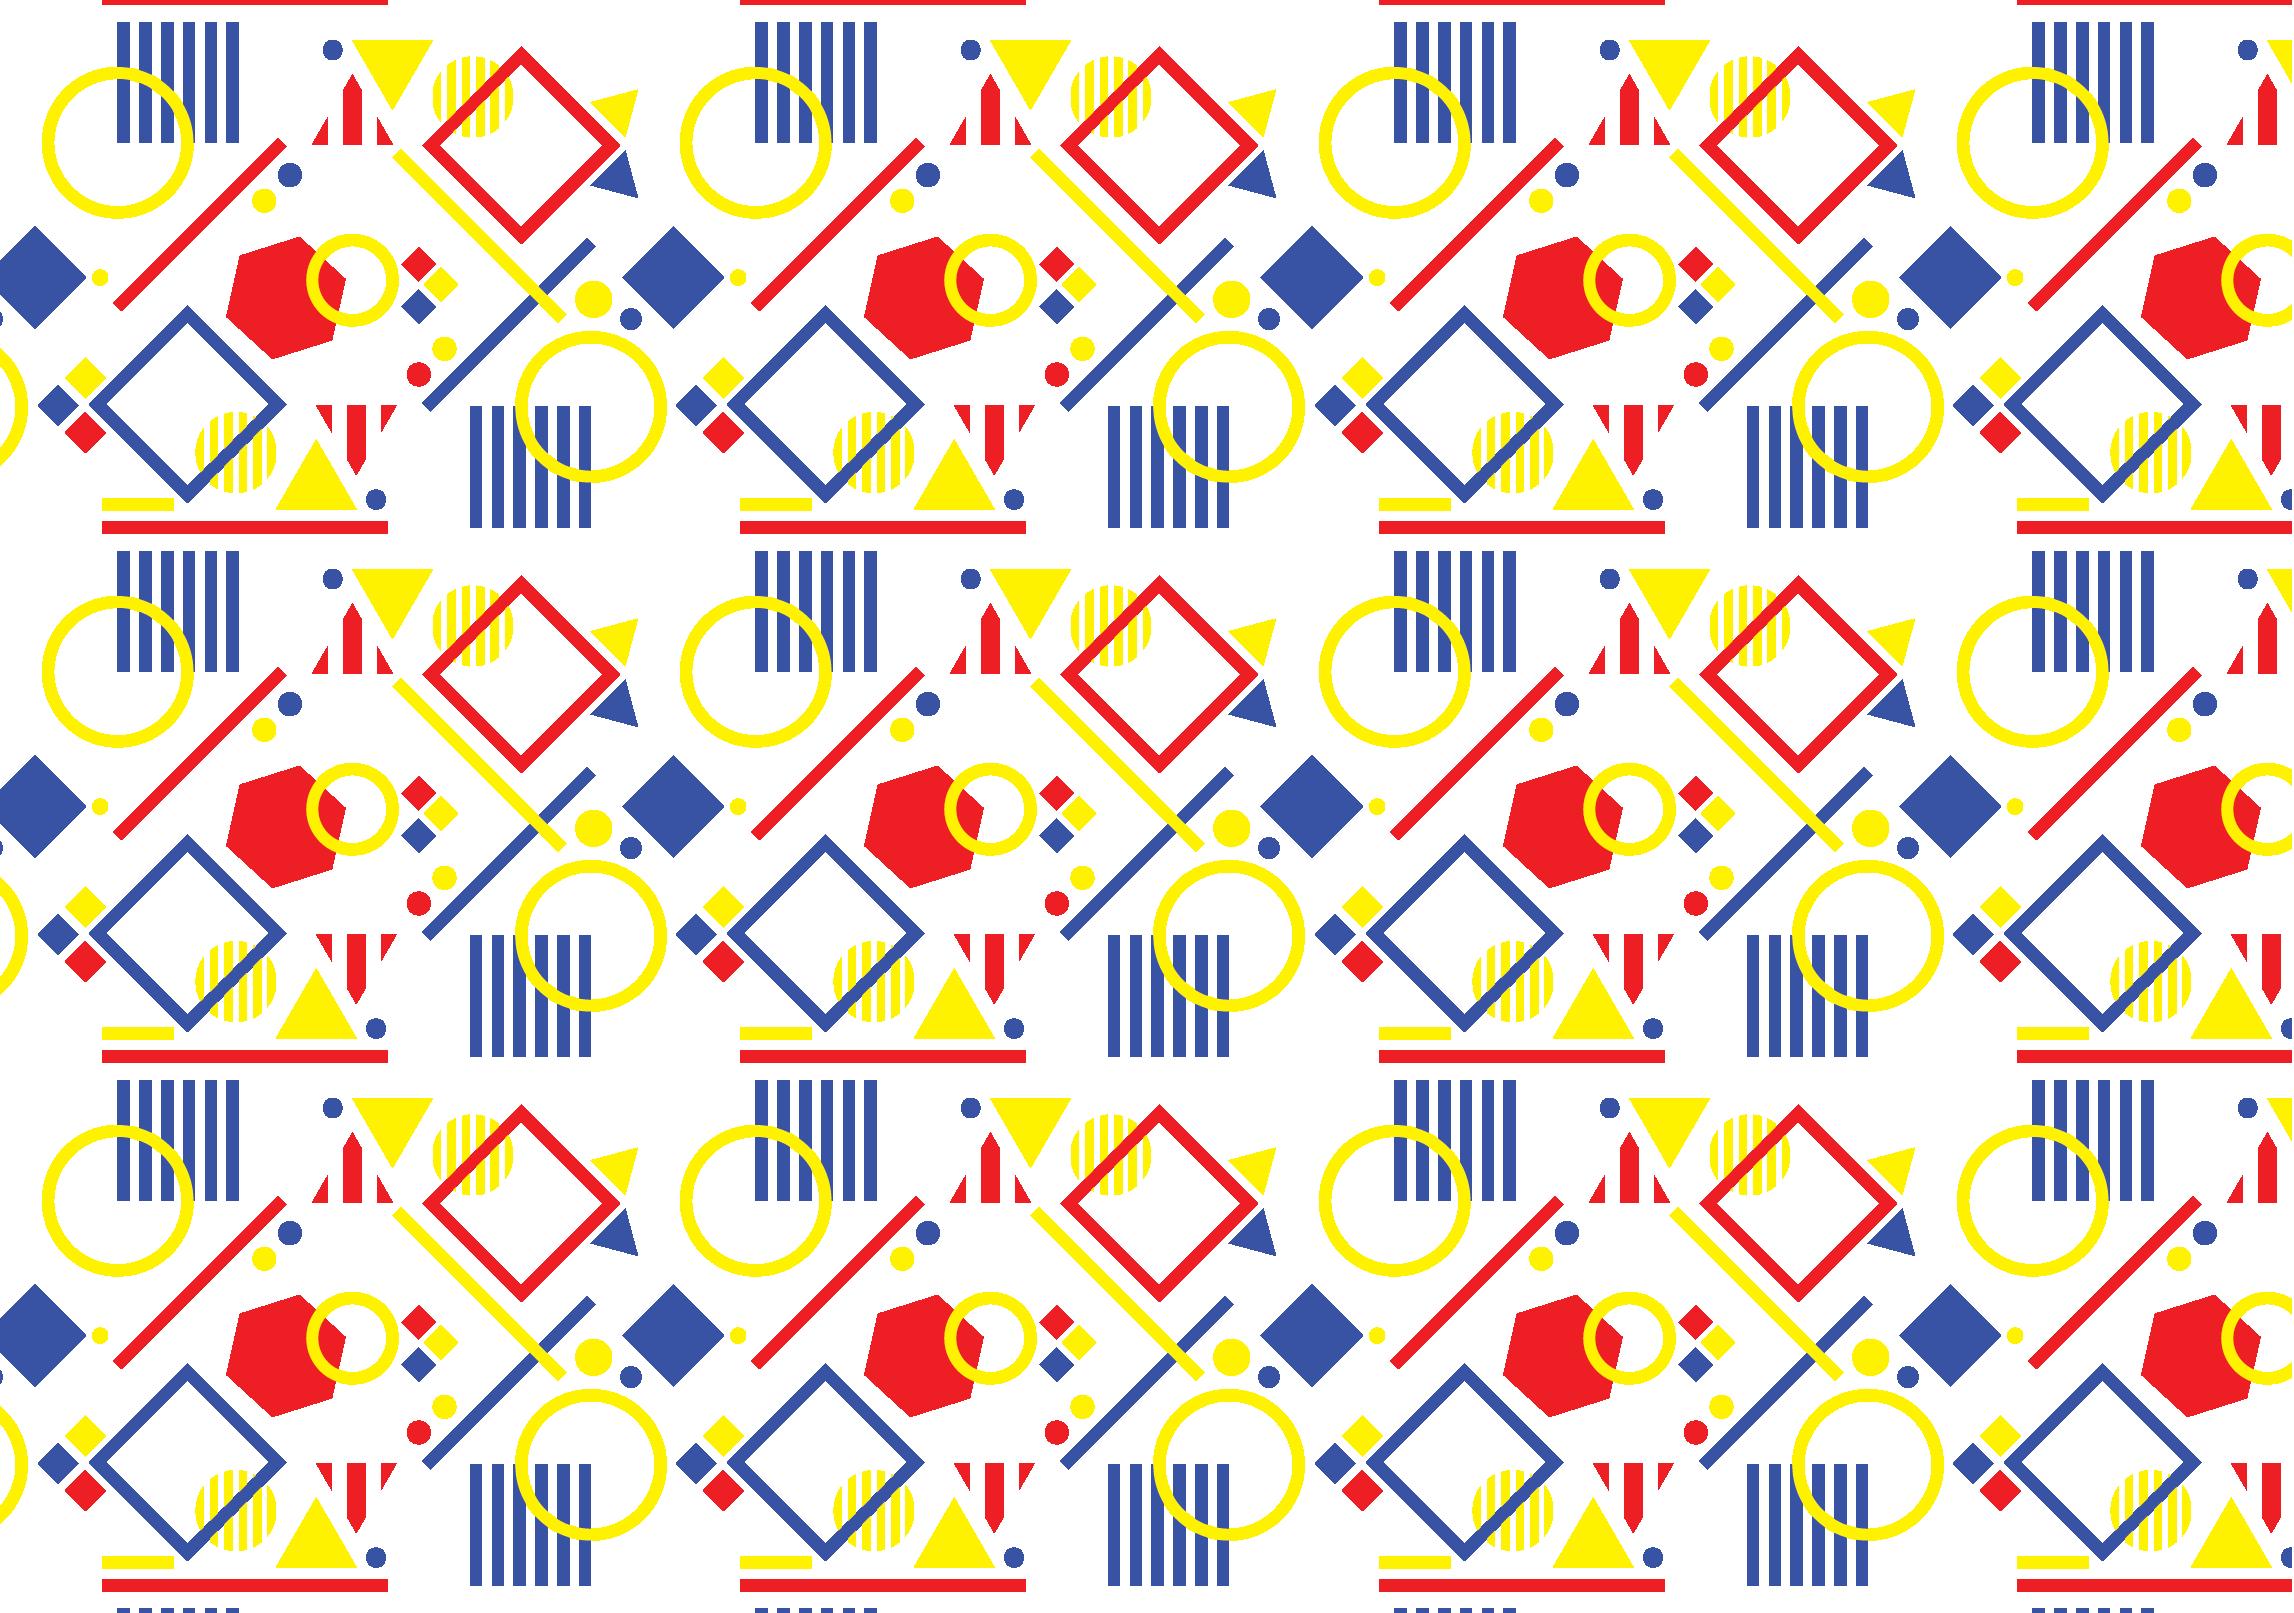 liz_exhibition_pattern-02.png